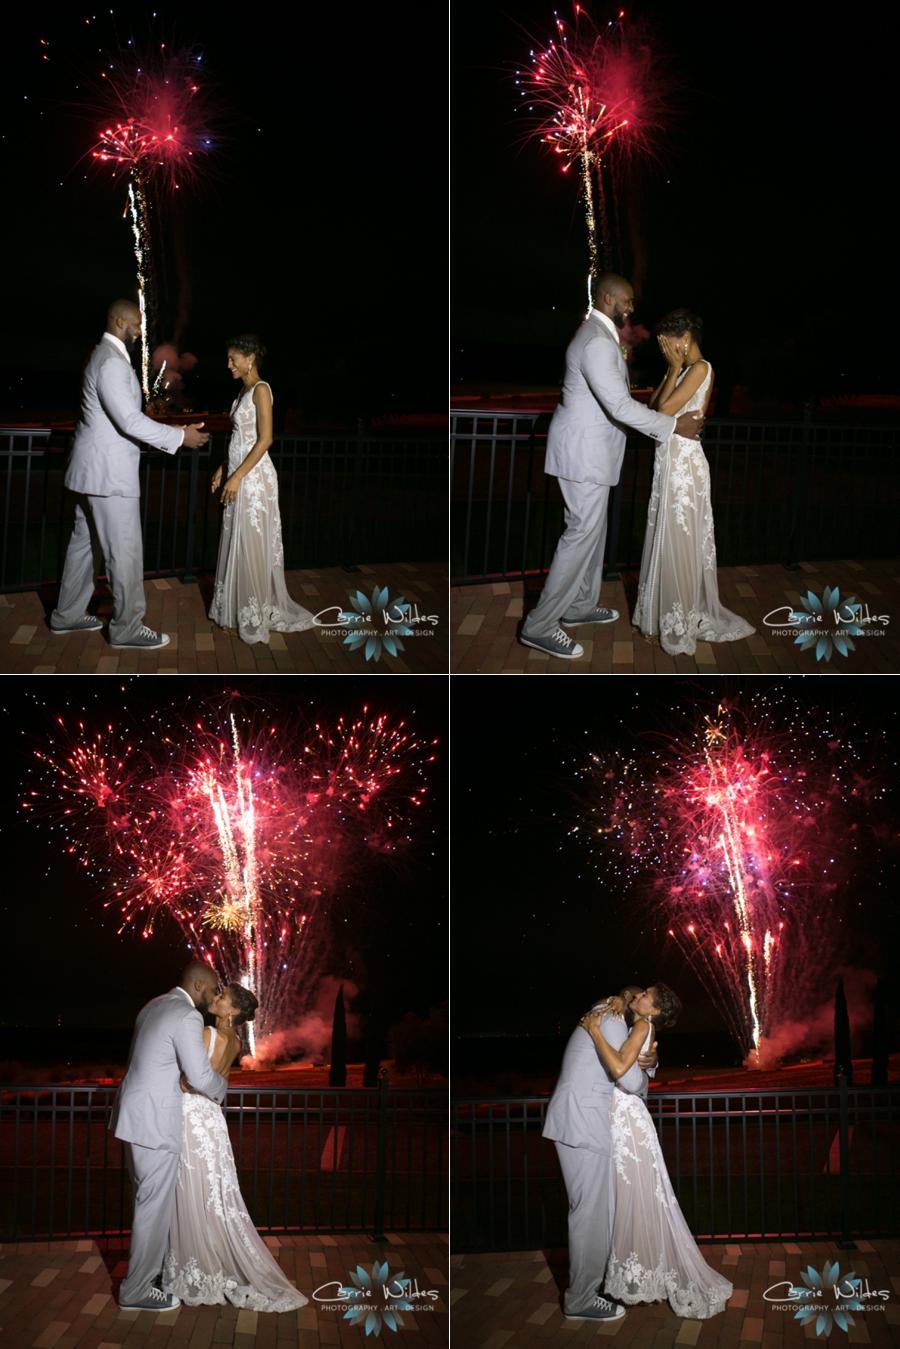 8_14_15 Bella Collina Wedding Fireworks_0001.jpg